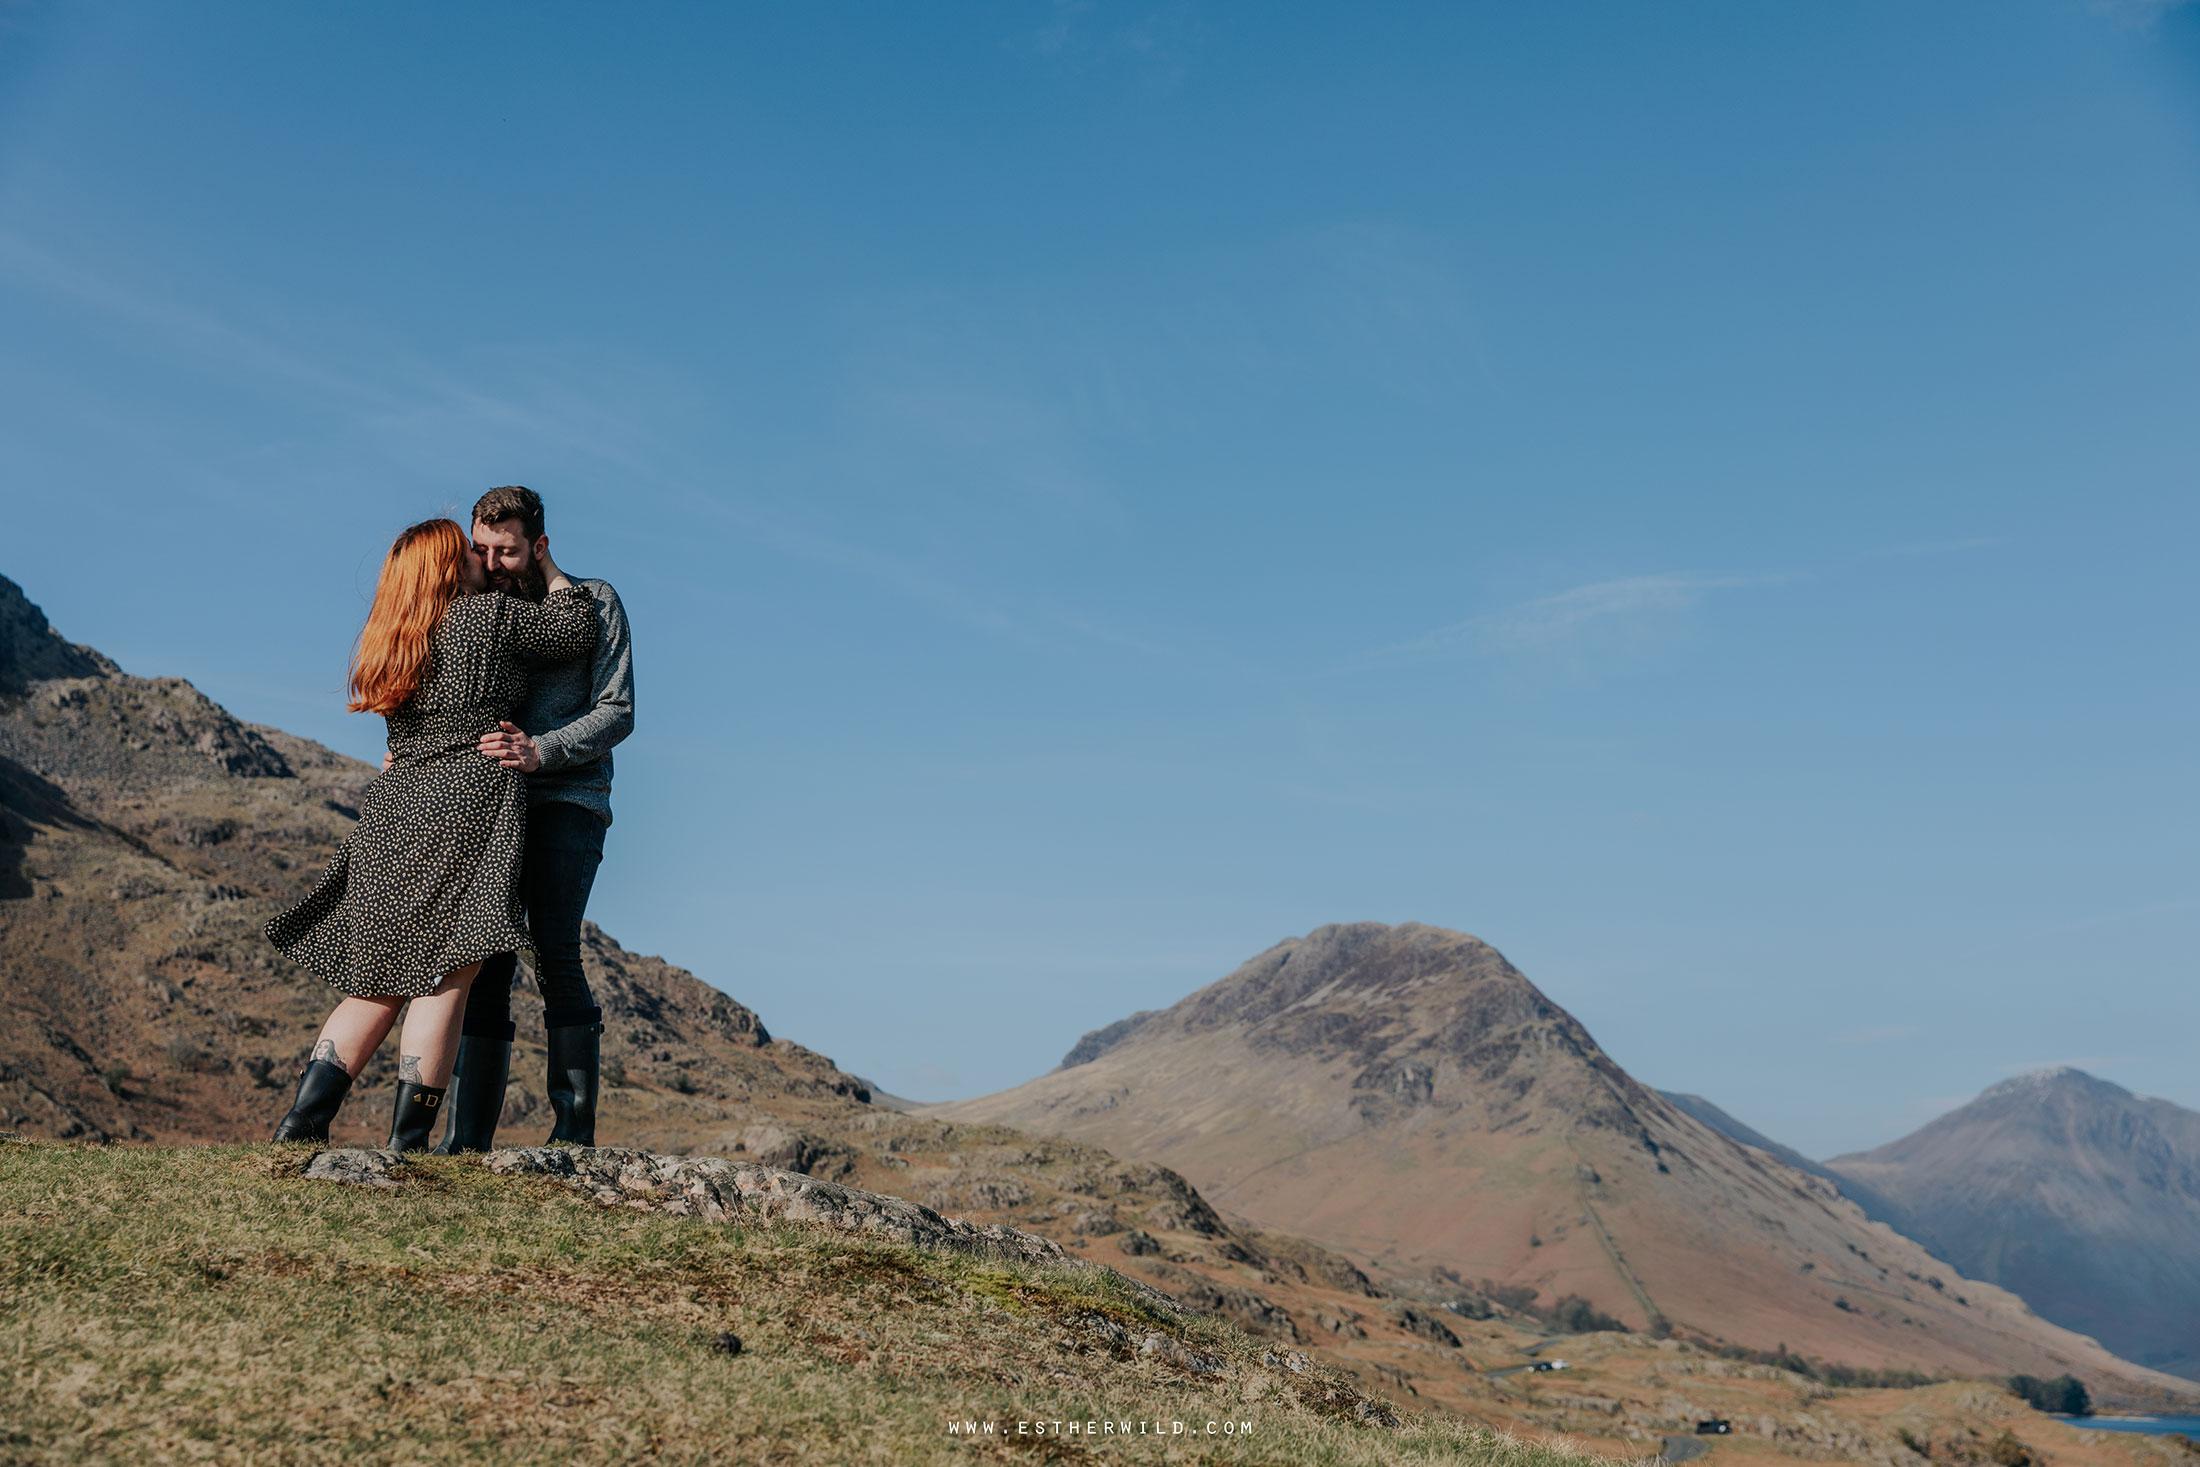 Cumbria_Lake_District_Wasdale_Wedding_Photographer_Destination_Engagement_Anniversary_Esther_Wild_IMG_3653.jpg